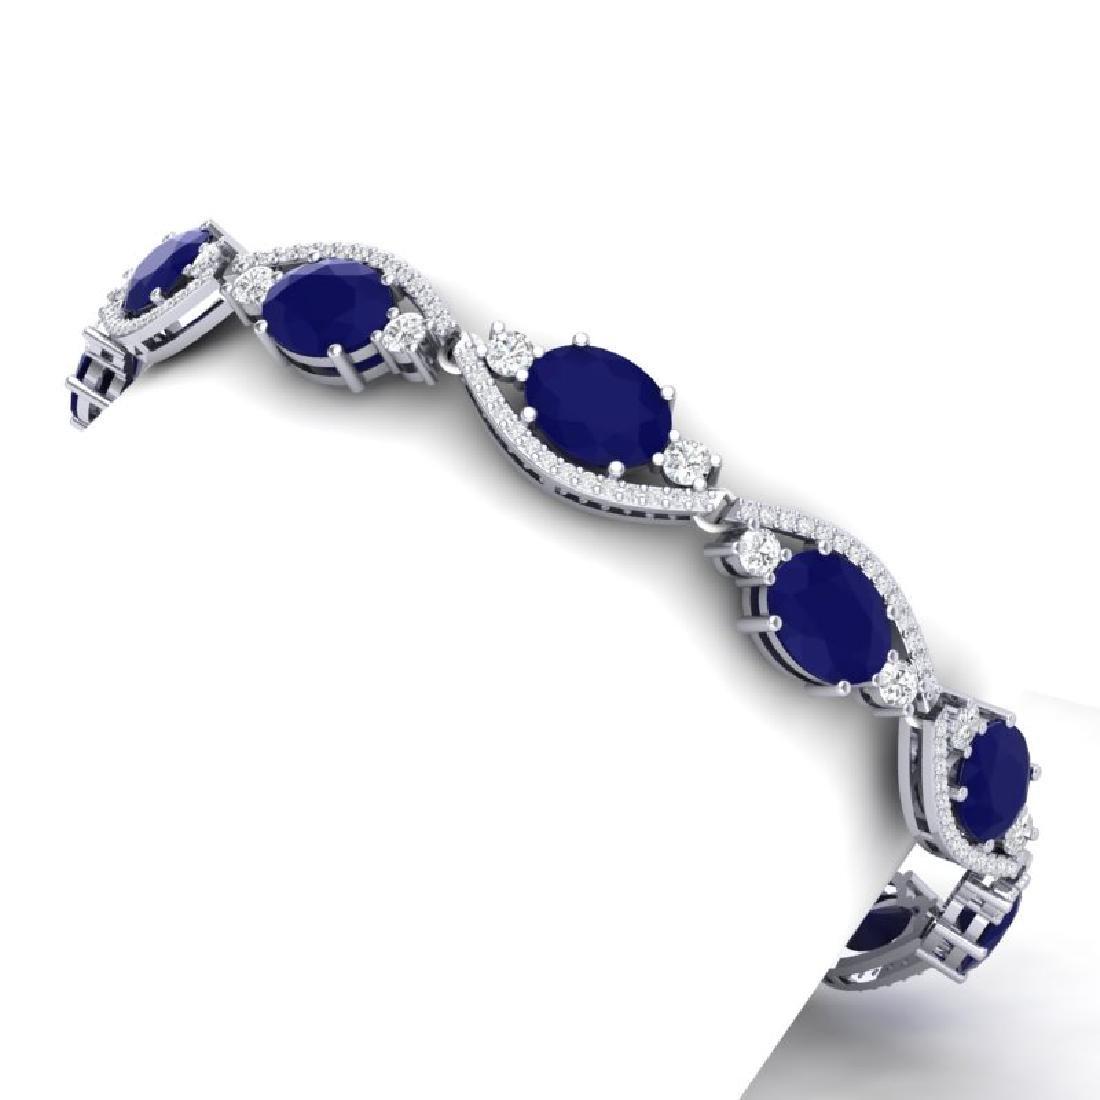 22.15 CTW Royalty Sapphire & VS Diamond Bracelet 18K - 2